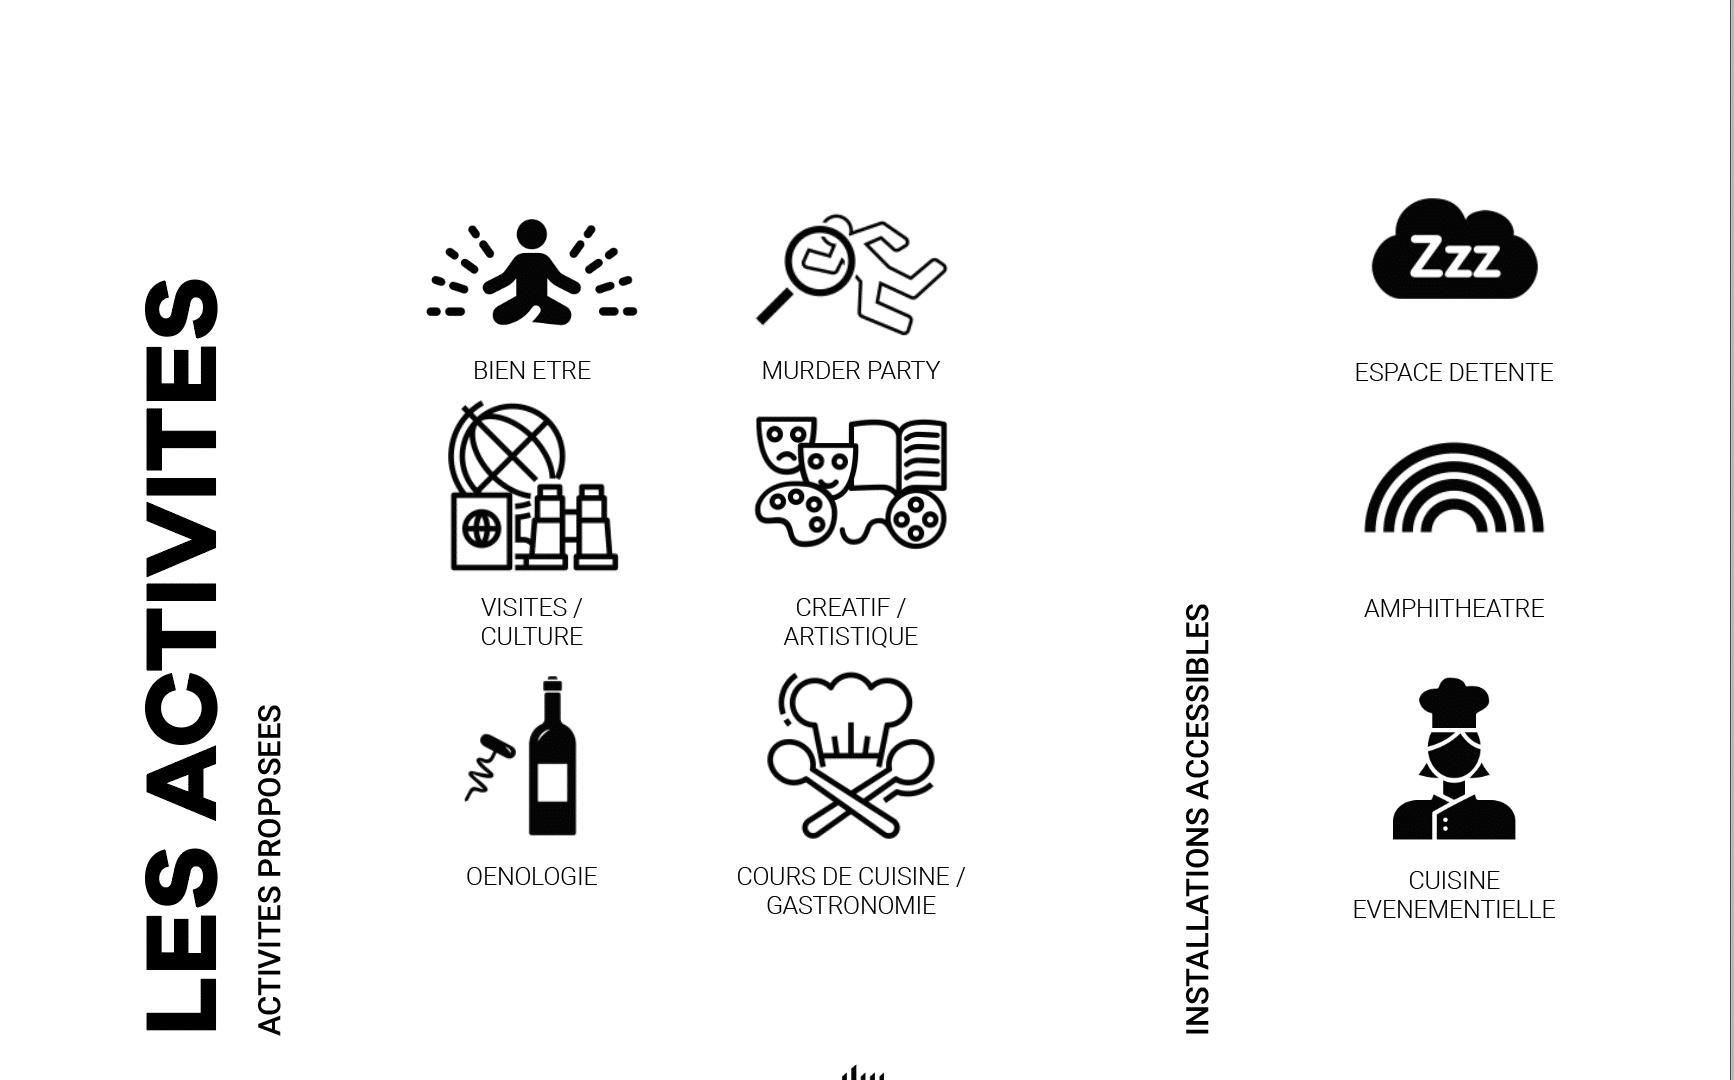 craiecraie-architecture-lyon-design-woraces-identite